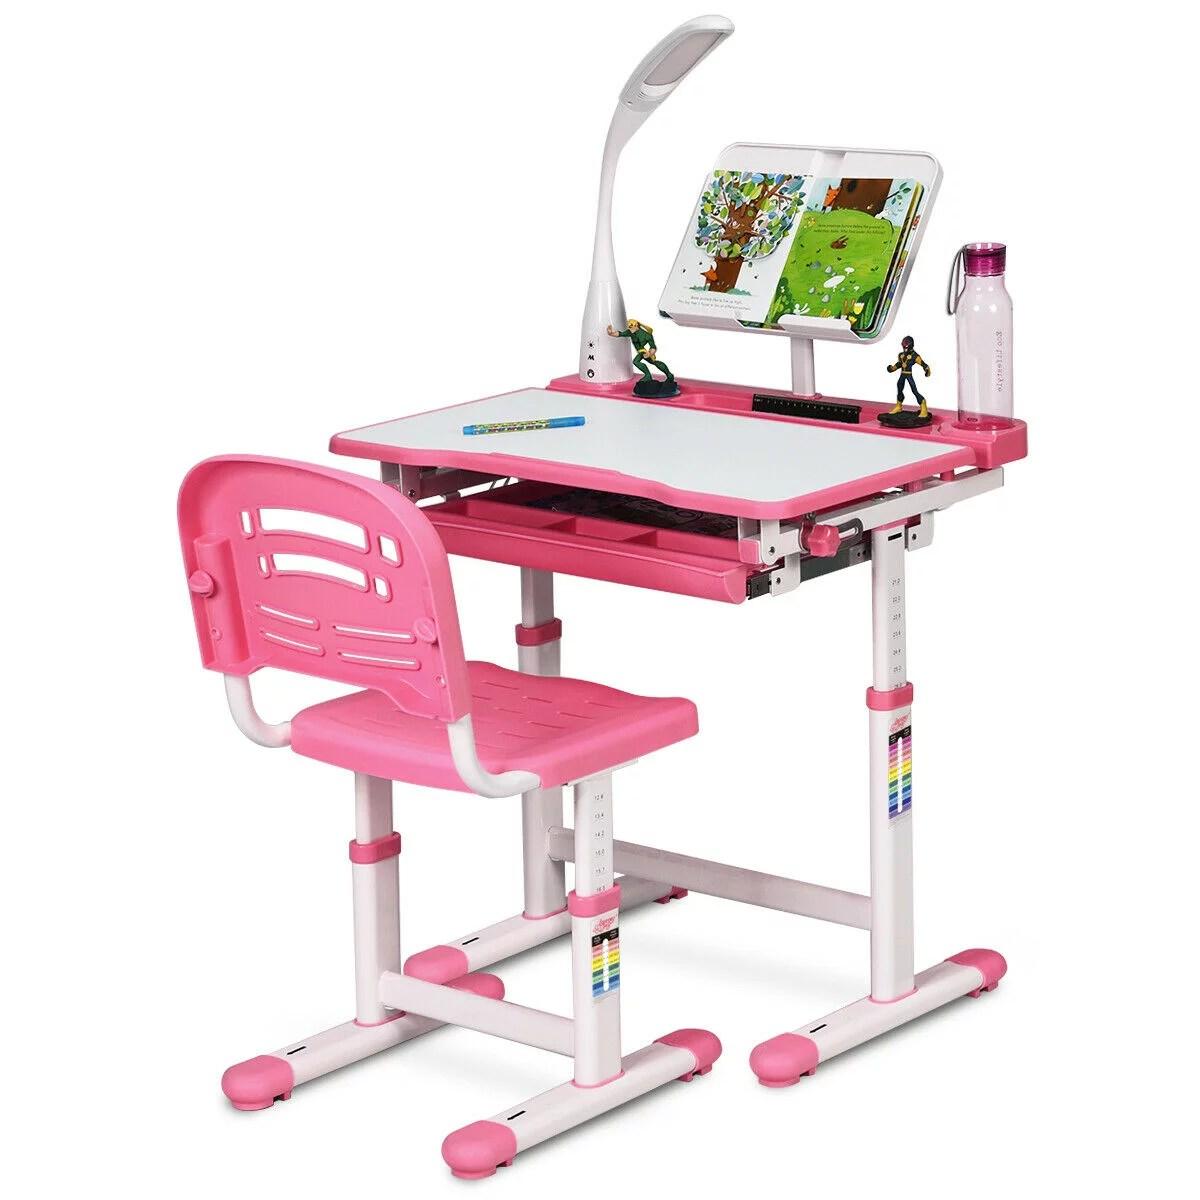 gymax height adjustable kids desk chair set study drawing w lamp bookstand pink walmart com